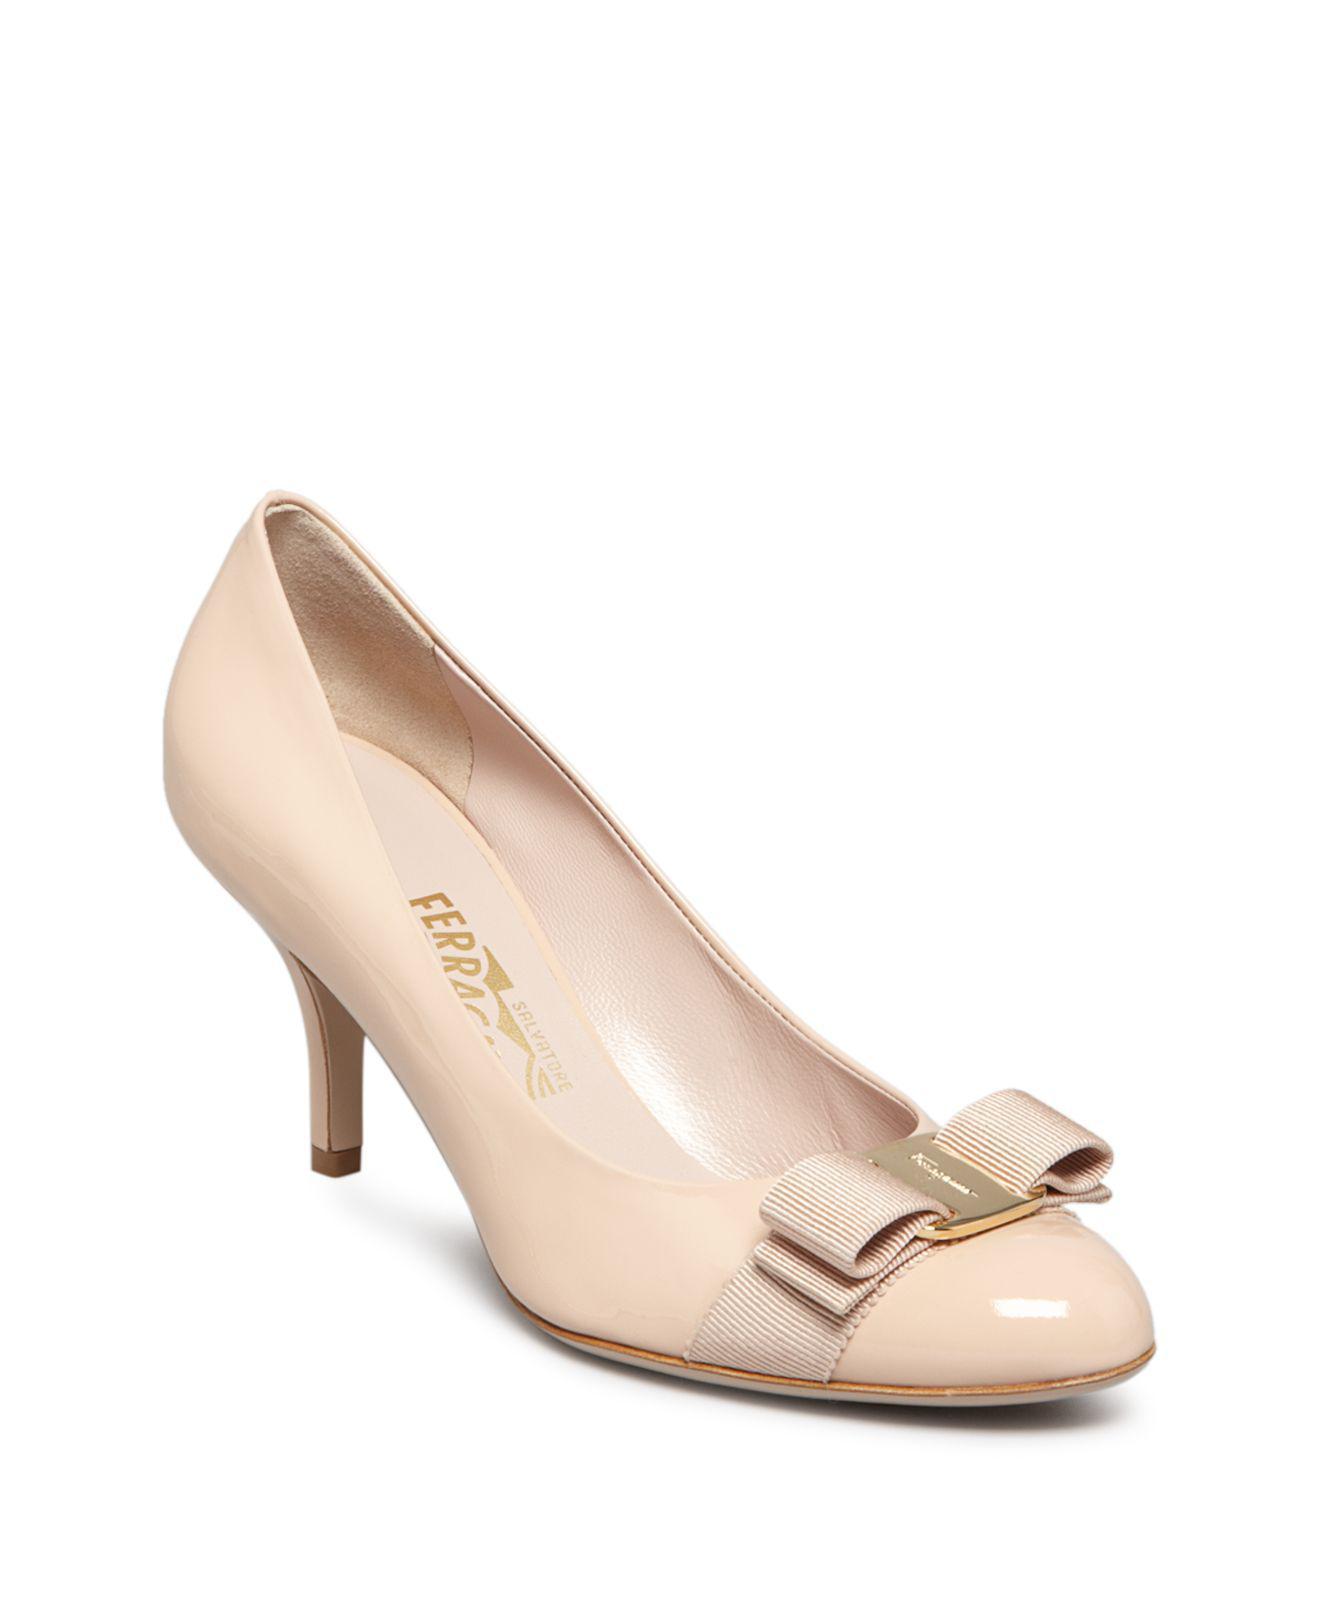 Salvatore Ferragamo Shoes Heeled Mules